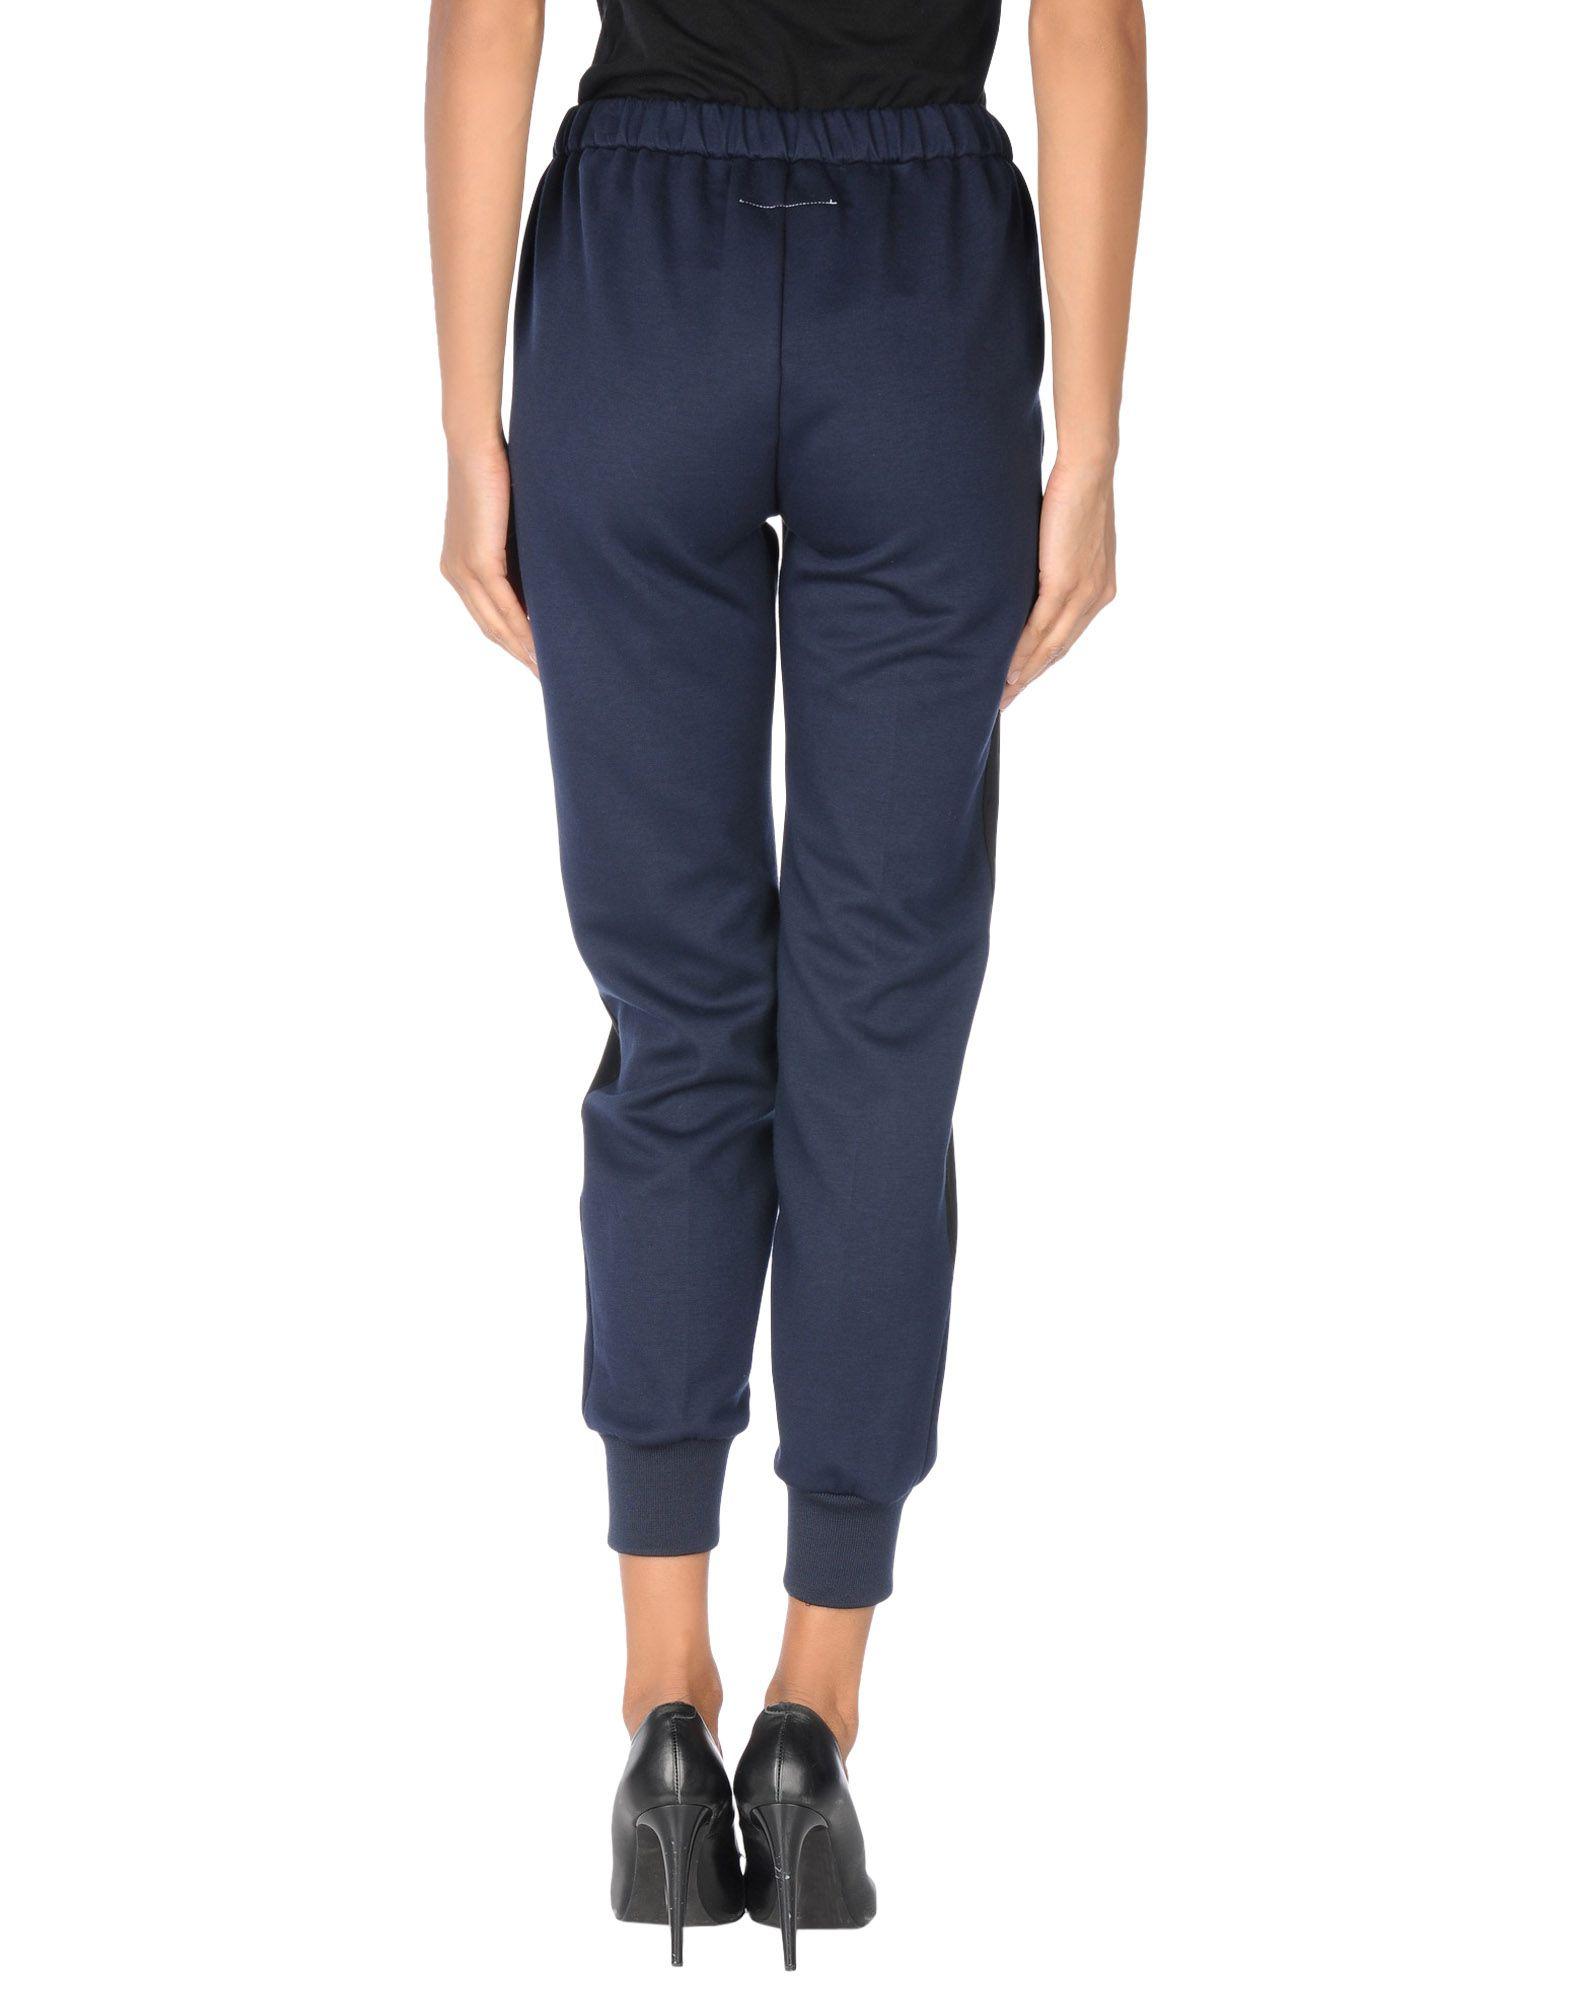 Lyst mm6 by maison martin margiela casual pants in blue for 10 moulmein rise la maison